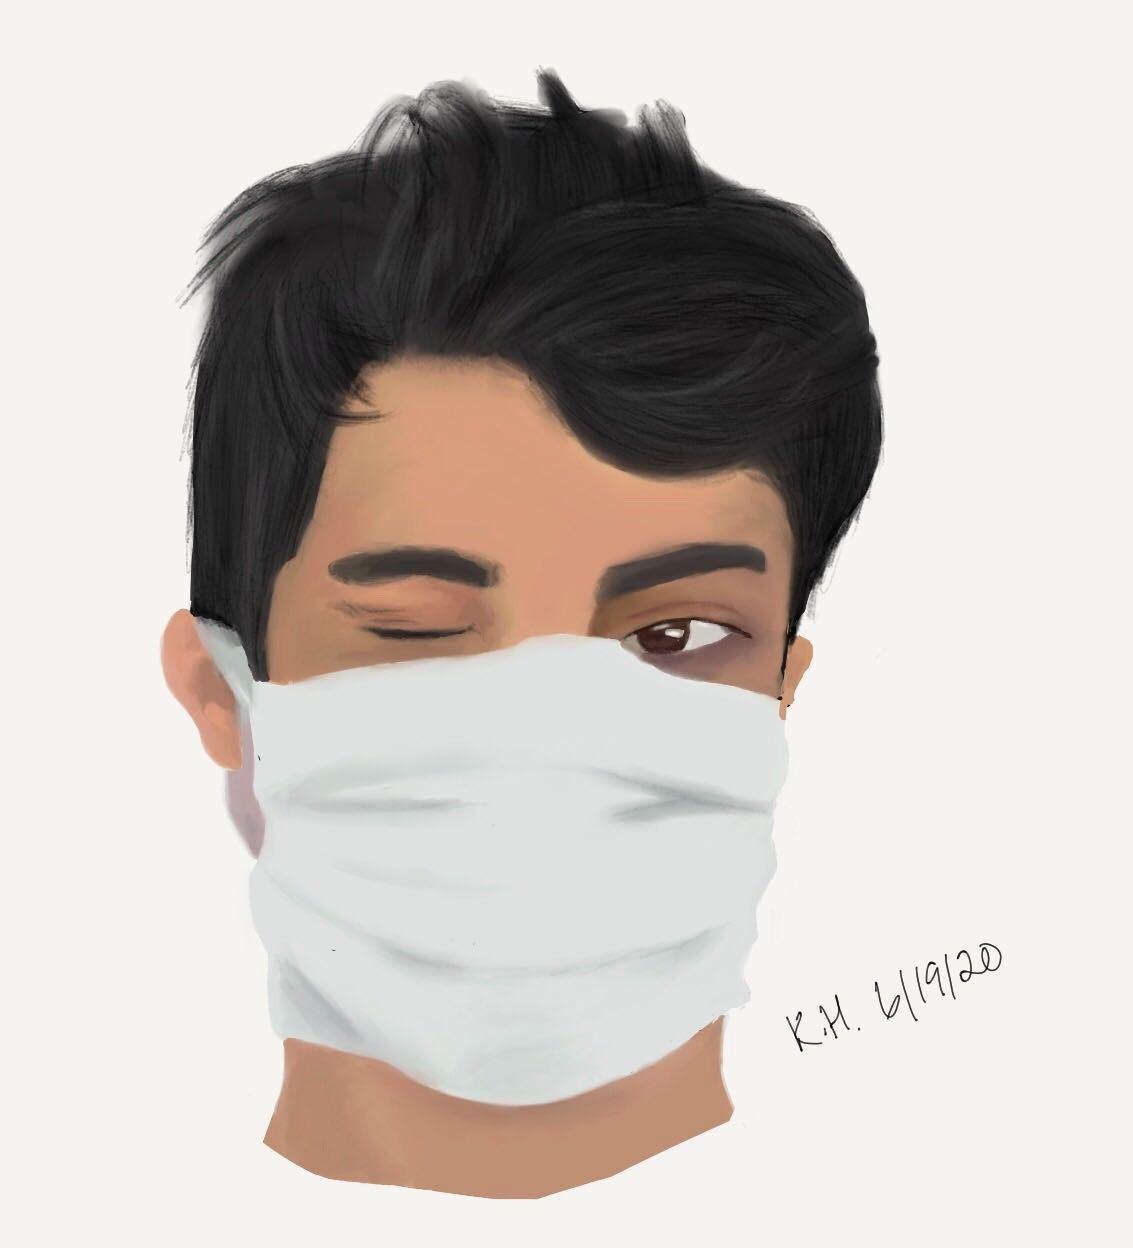 https://cloud-brjs9o780.vercel.app/0paper.sketches.1.jpg